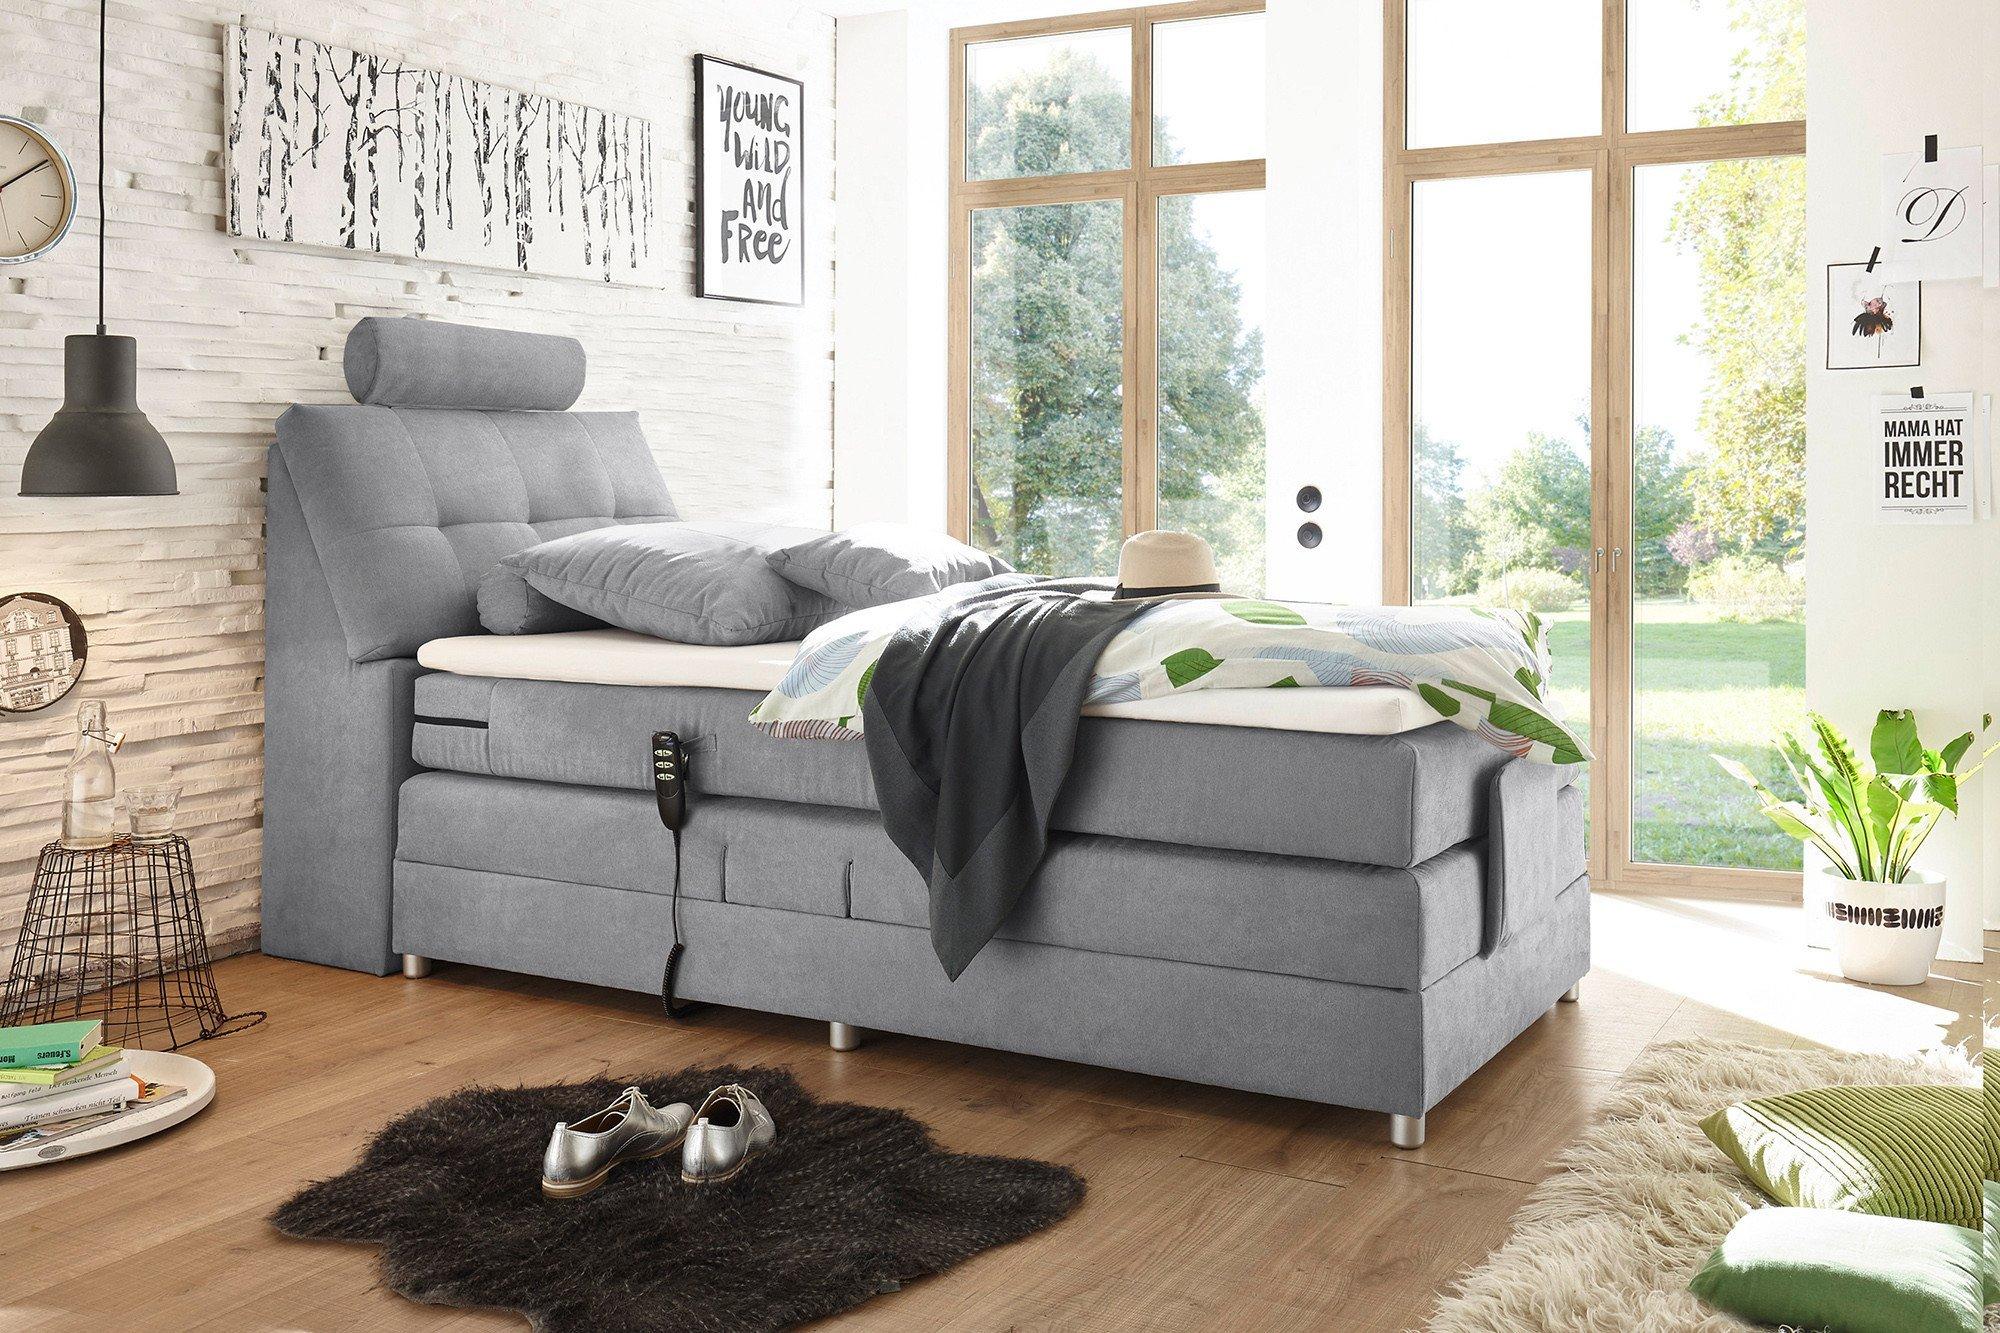 black red white boxspringbett palermo in grau ca 120 x 200 cm m bel letz ihr online shop. Black Bedroom Furniture Sets. Home Design Ideas